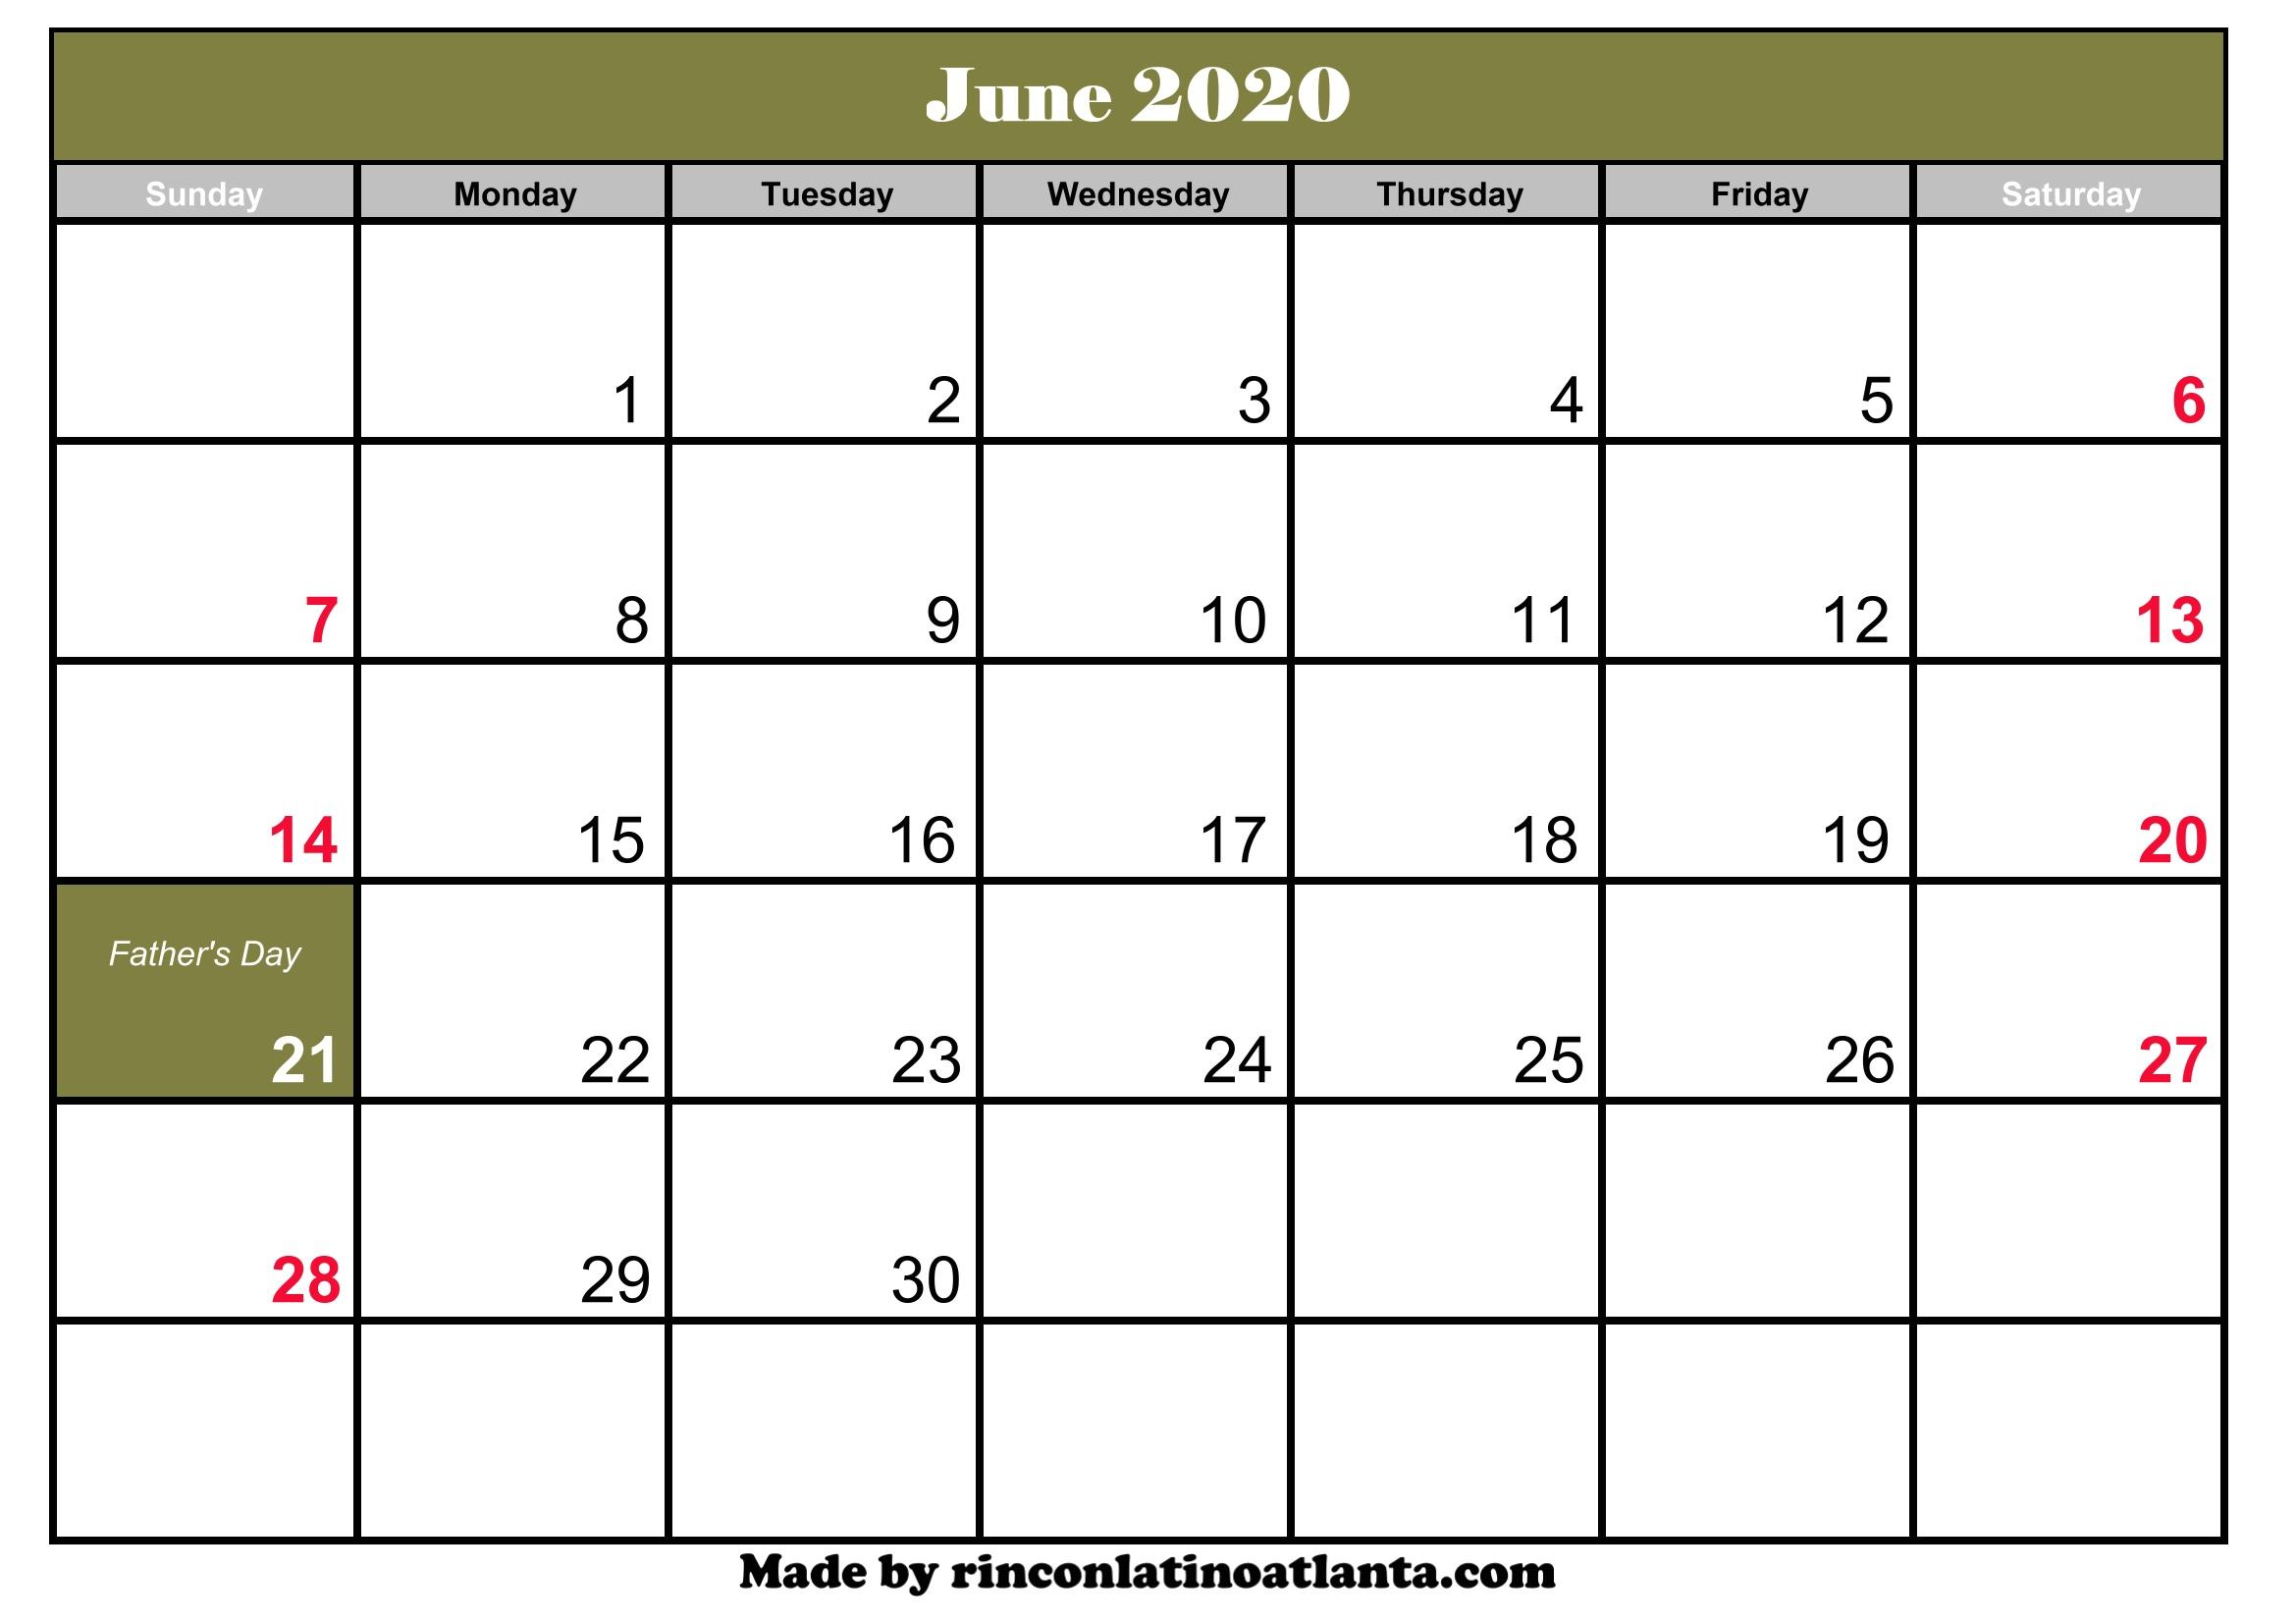 Calendar Of June 2020 Calendar Of June 2020 : Calendar Of